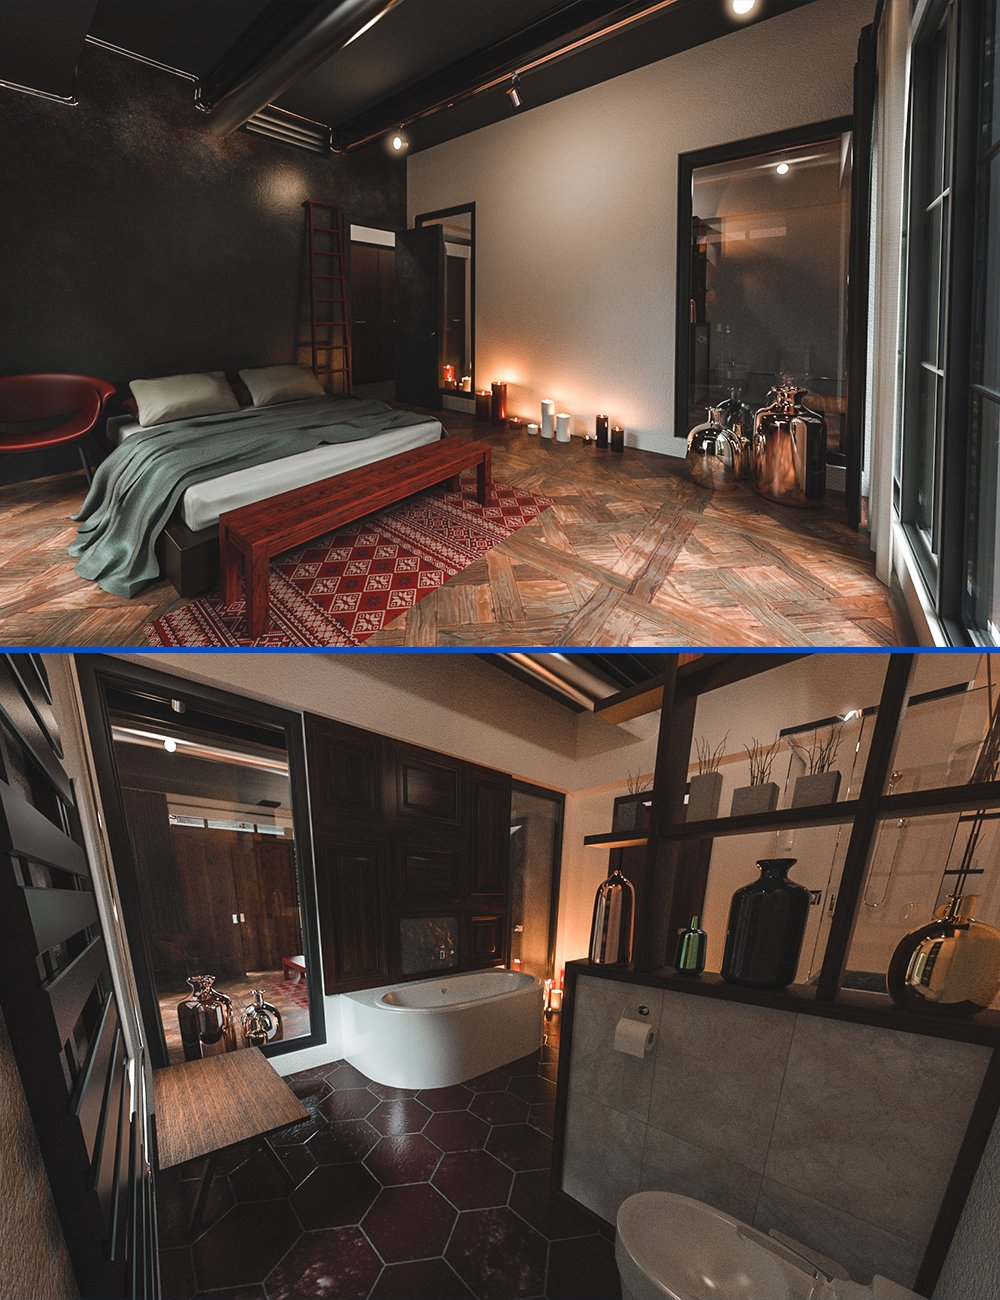 Timeless Bedroom by: bituka3d, 3D Models by Daz 3D